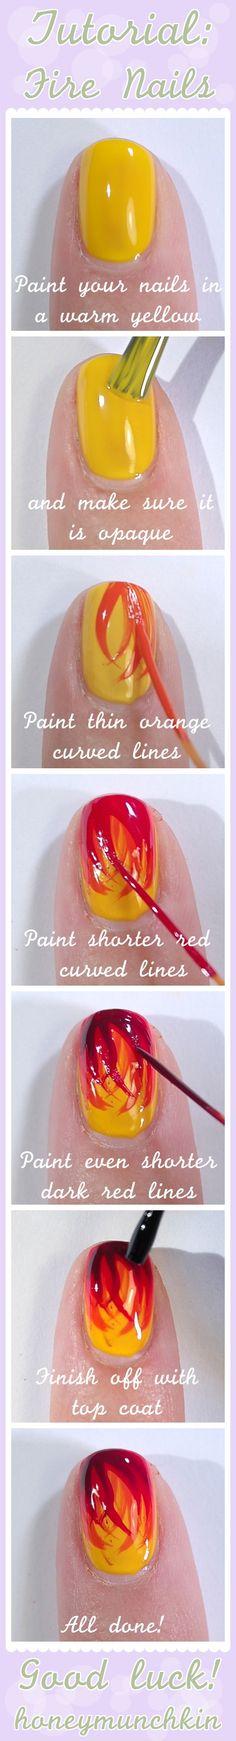 15 tutoriels nail art pour inspiration - Pose faux ongles